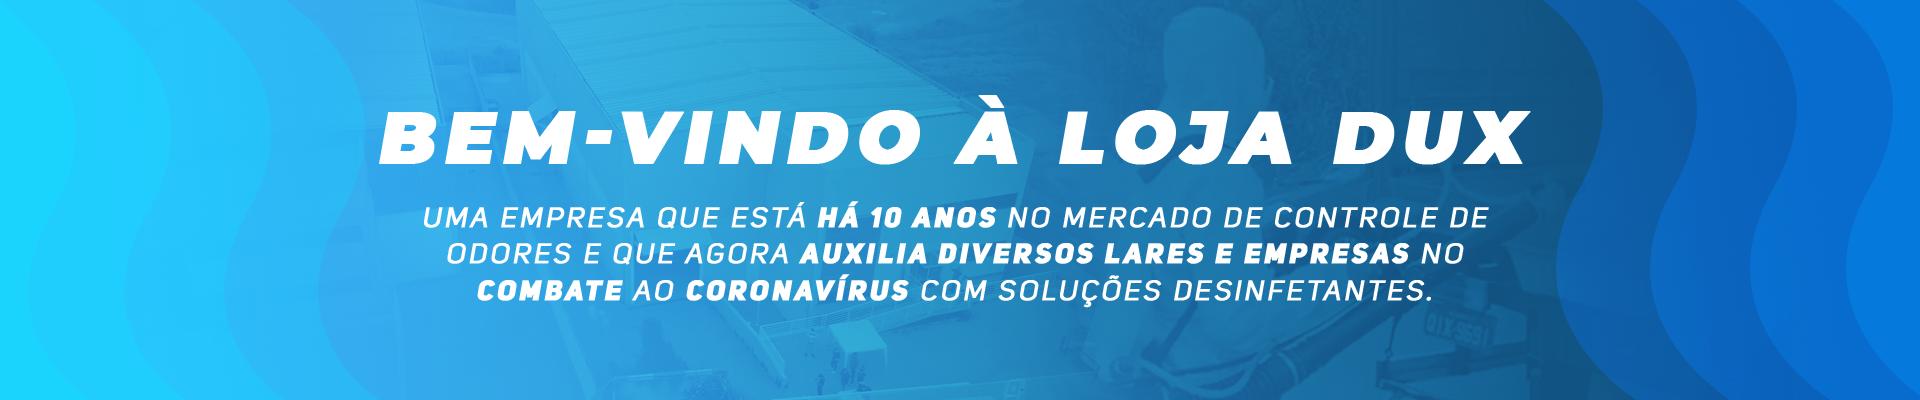 Dux Grupo - lojadux.com.br